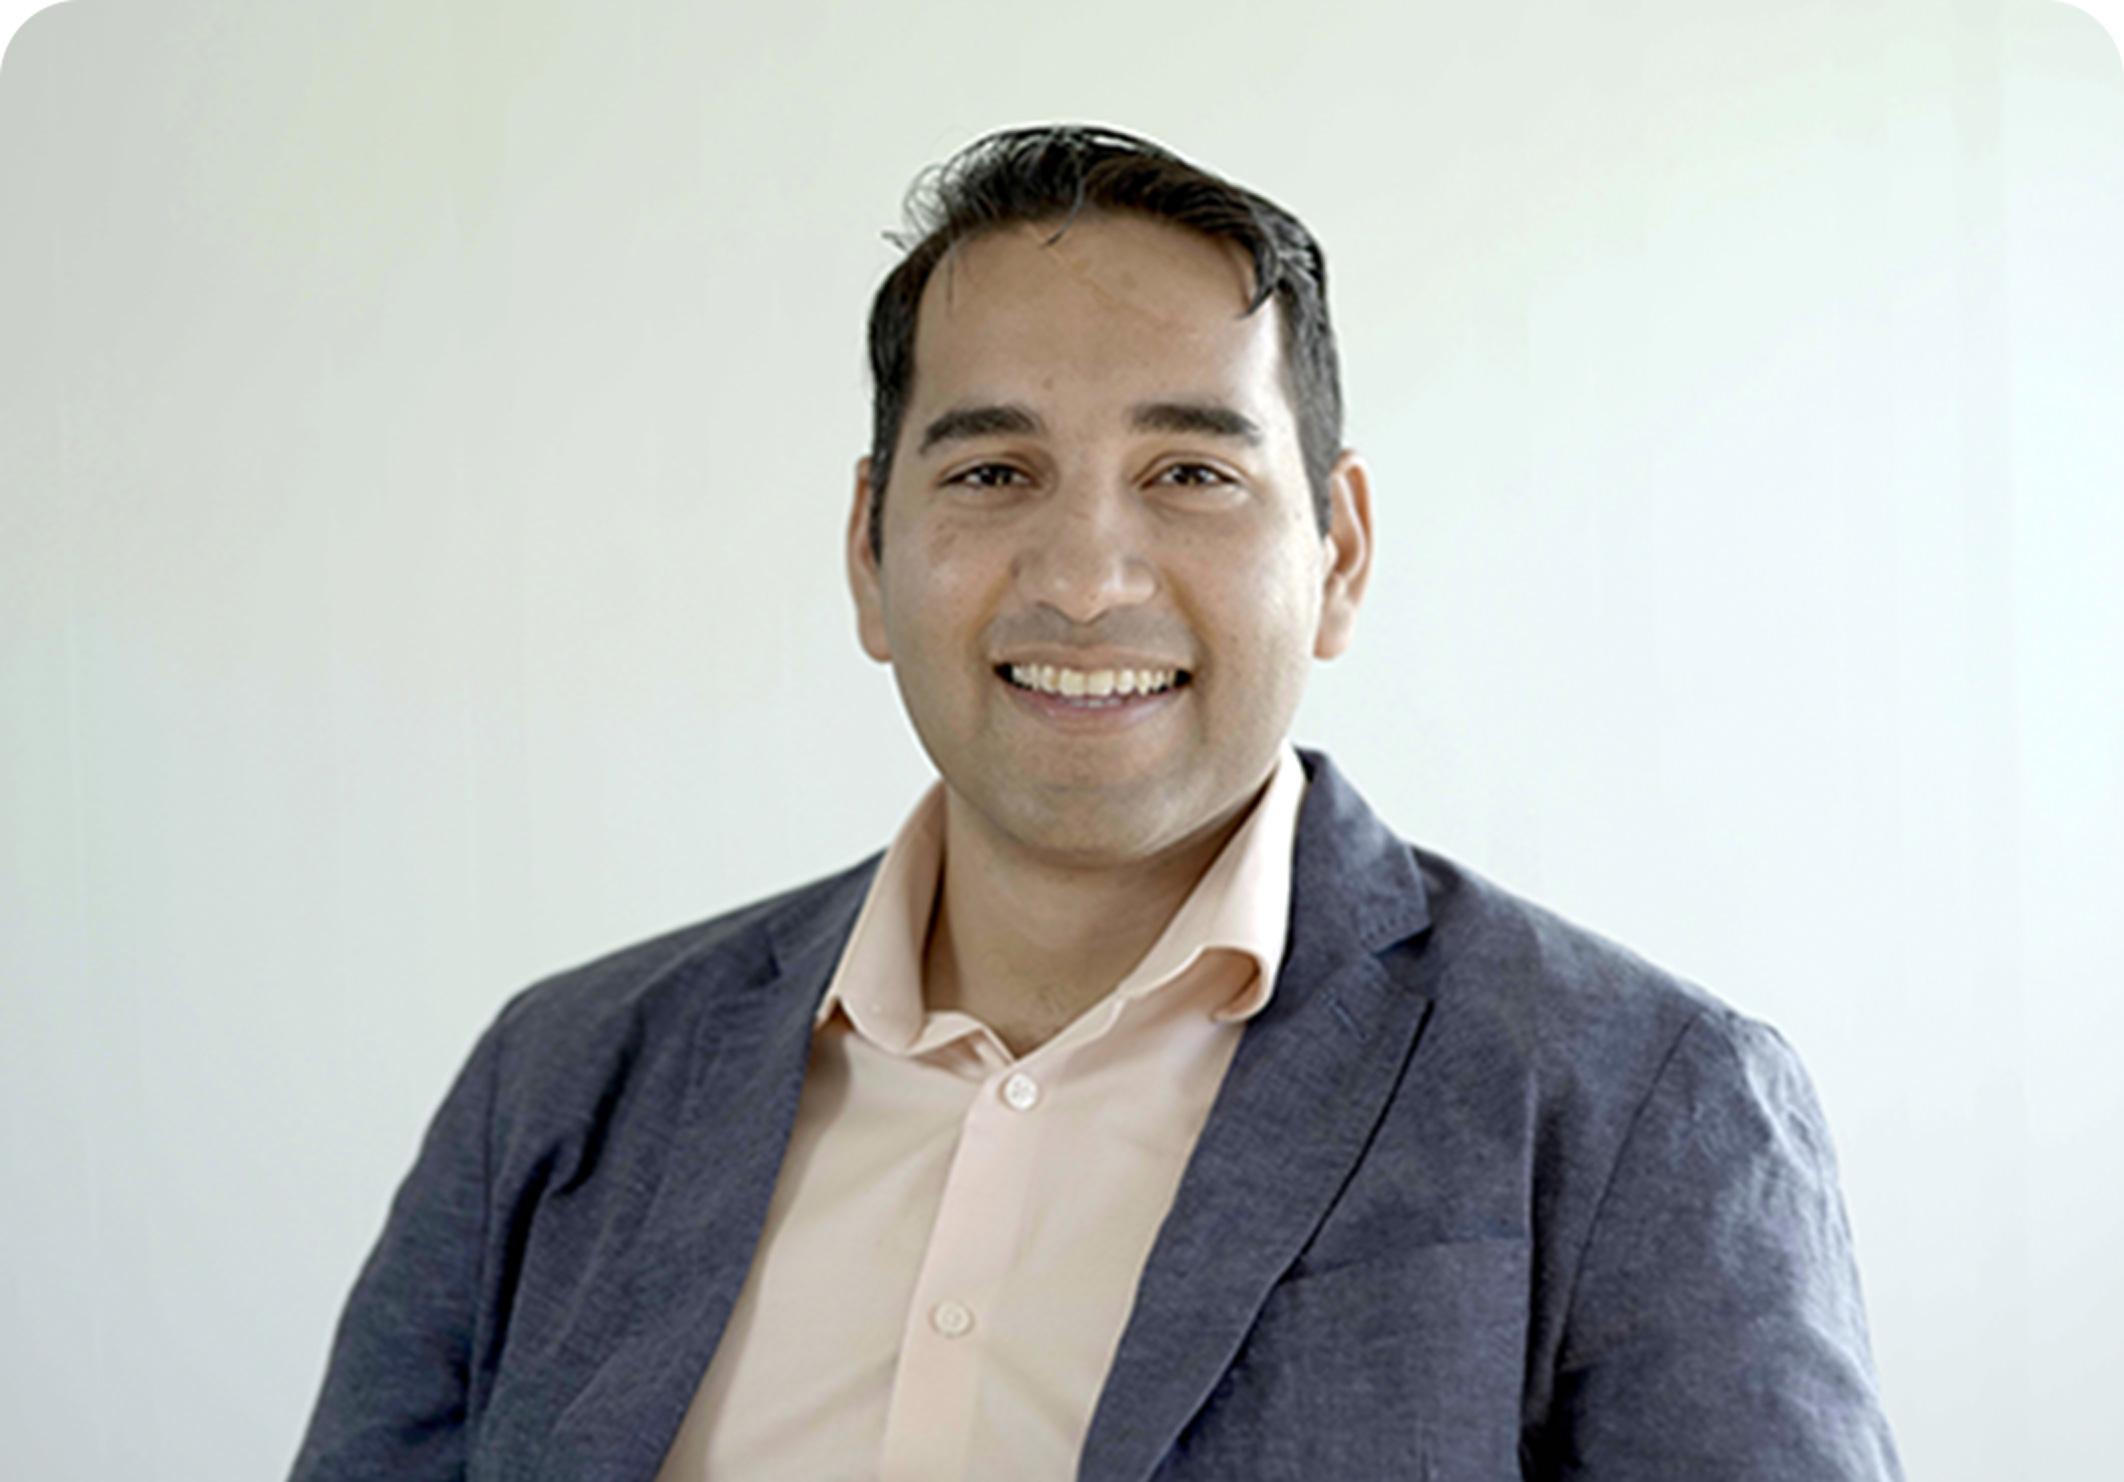 Ashar Rizqi, Co-Founder of the Blameless SRE Platform.